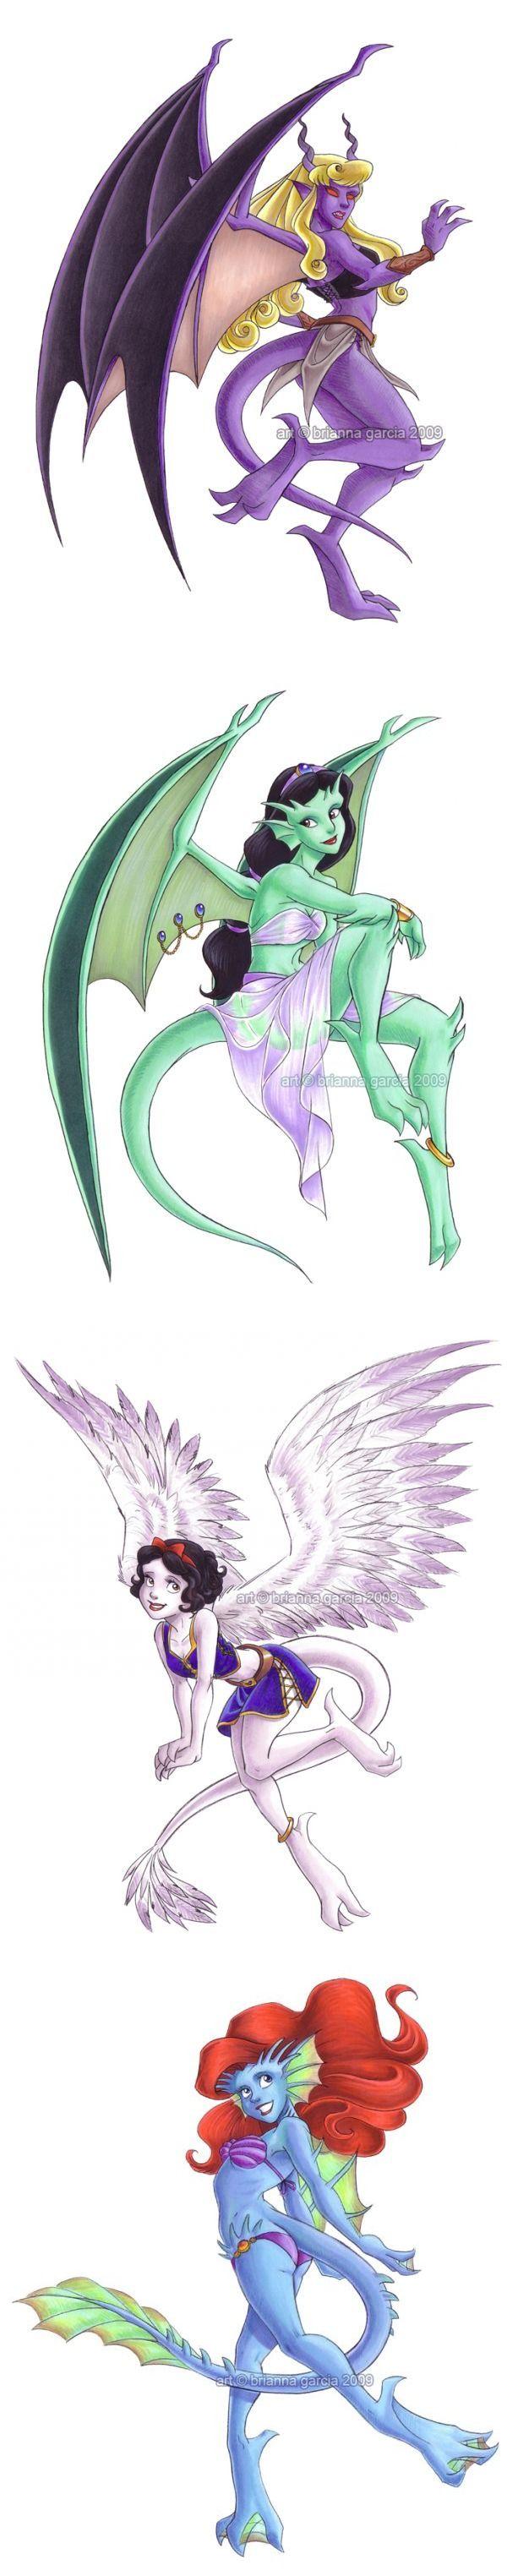 Disney Princess Gargoyles